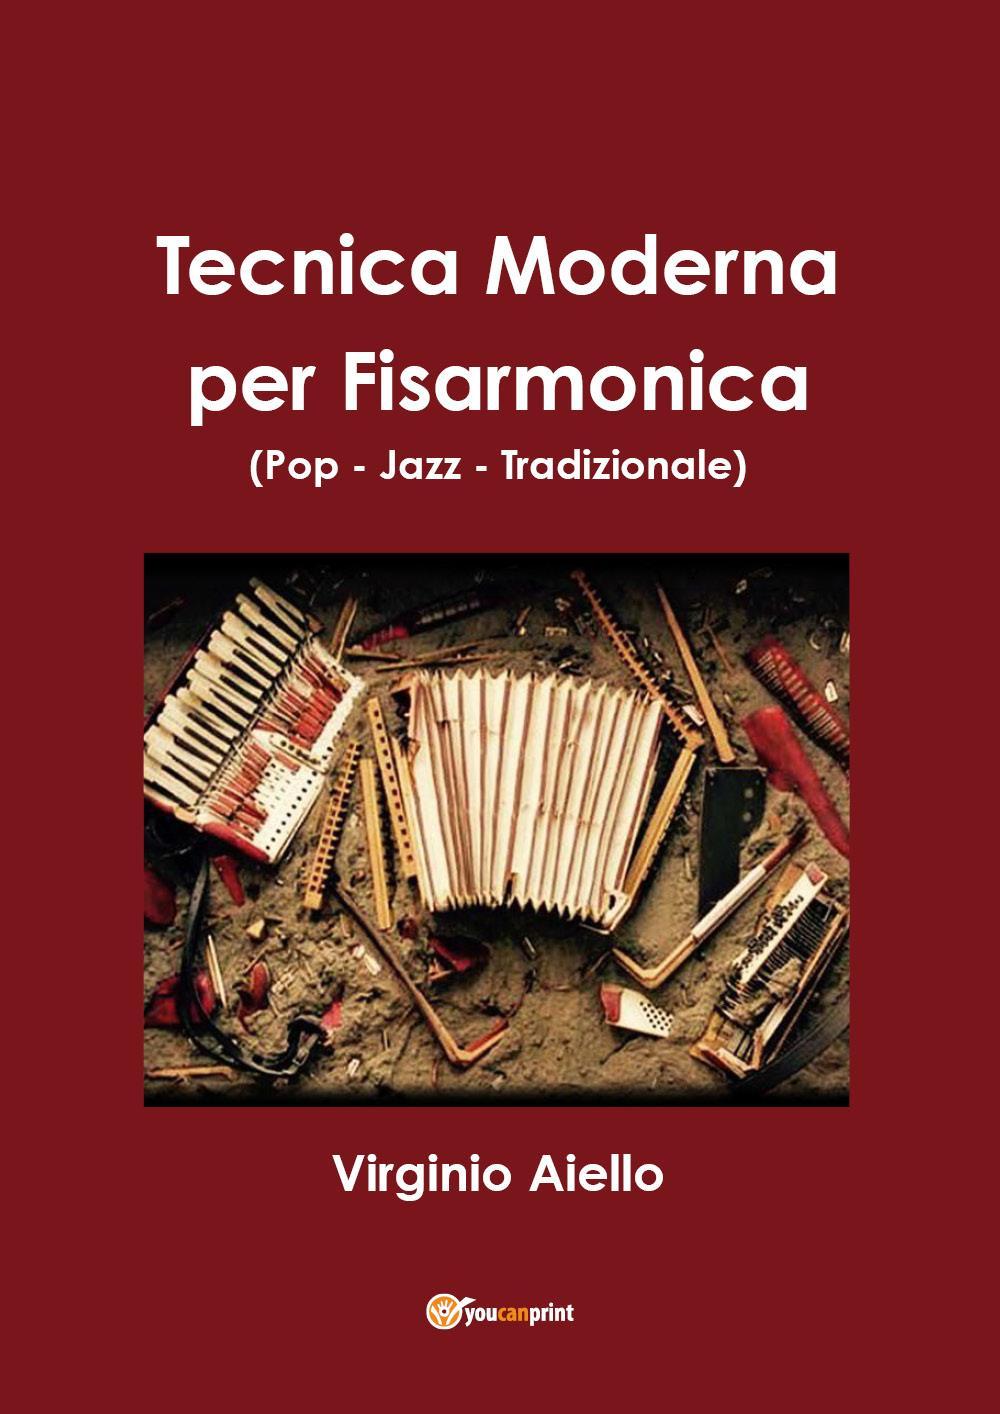 Tecnica Moderna per Fisarmonica (Pop - Jazz - Tradizionale)